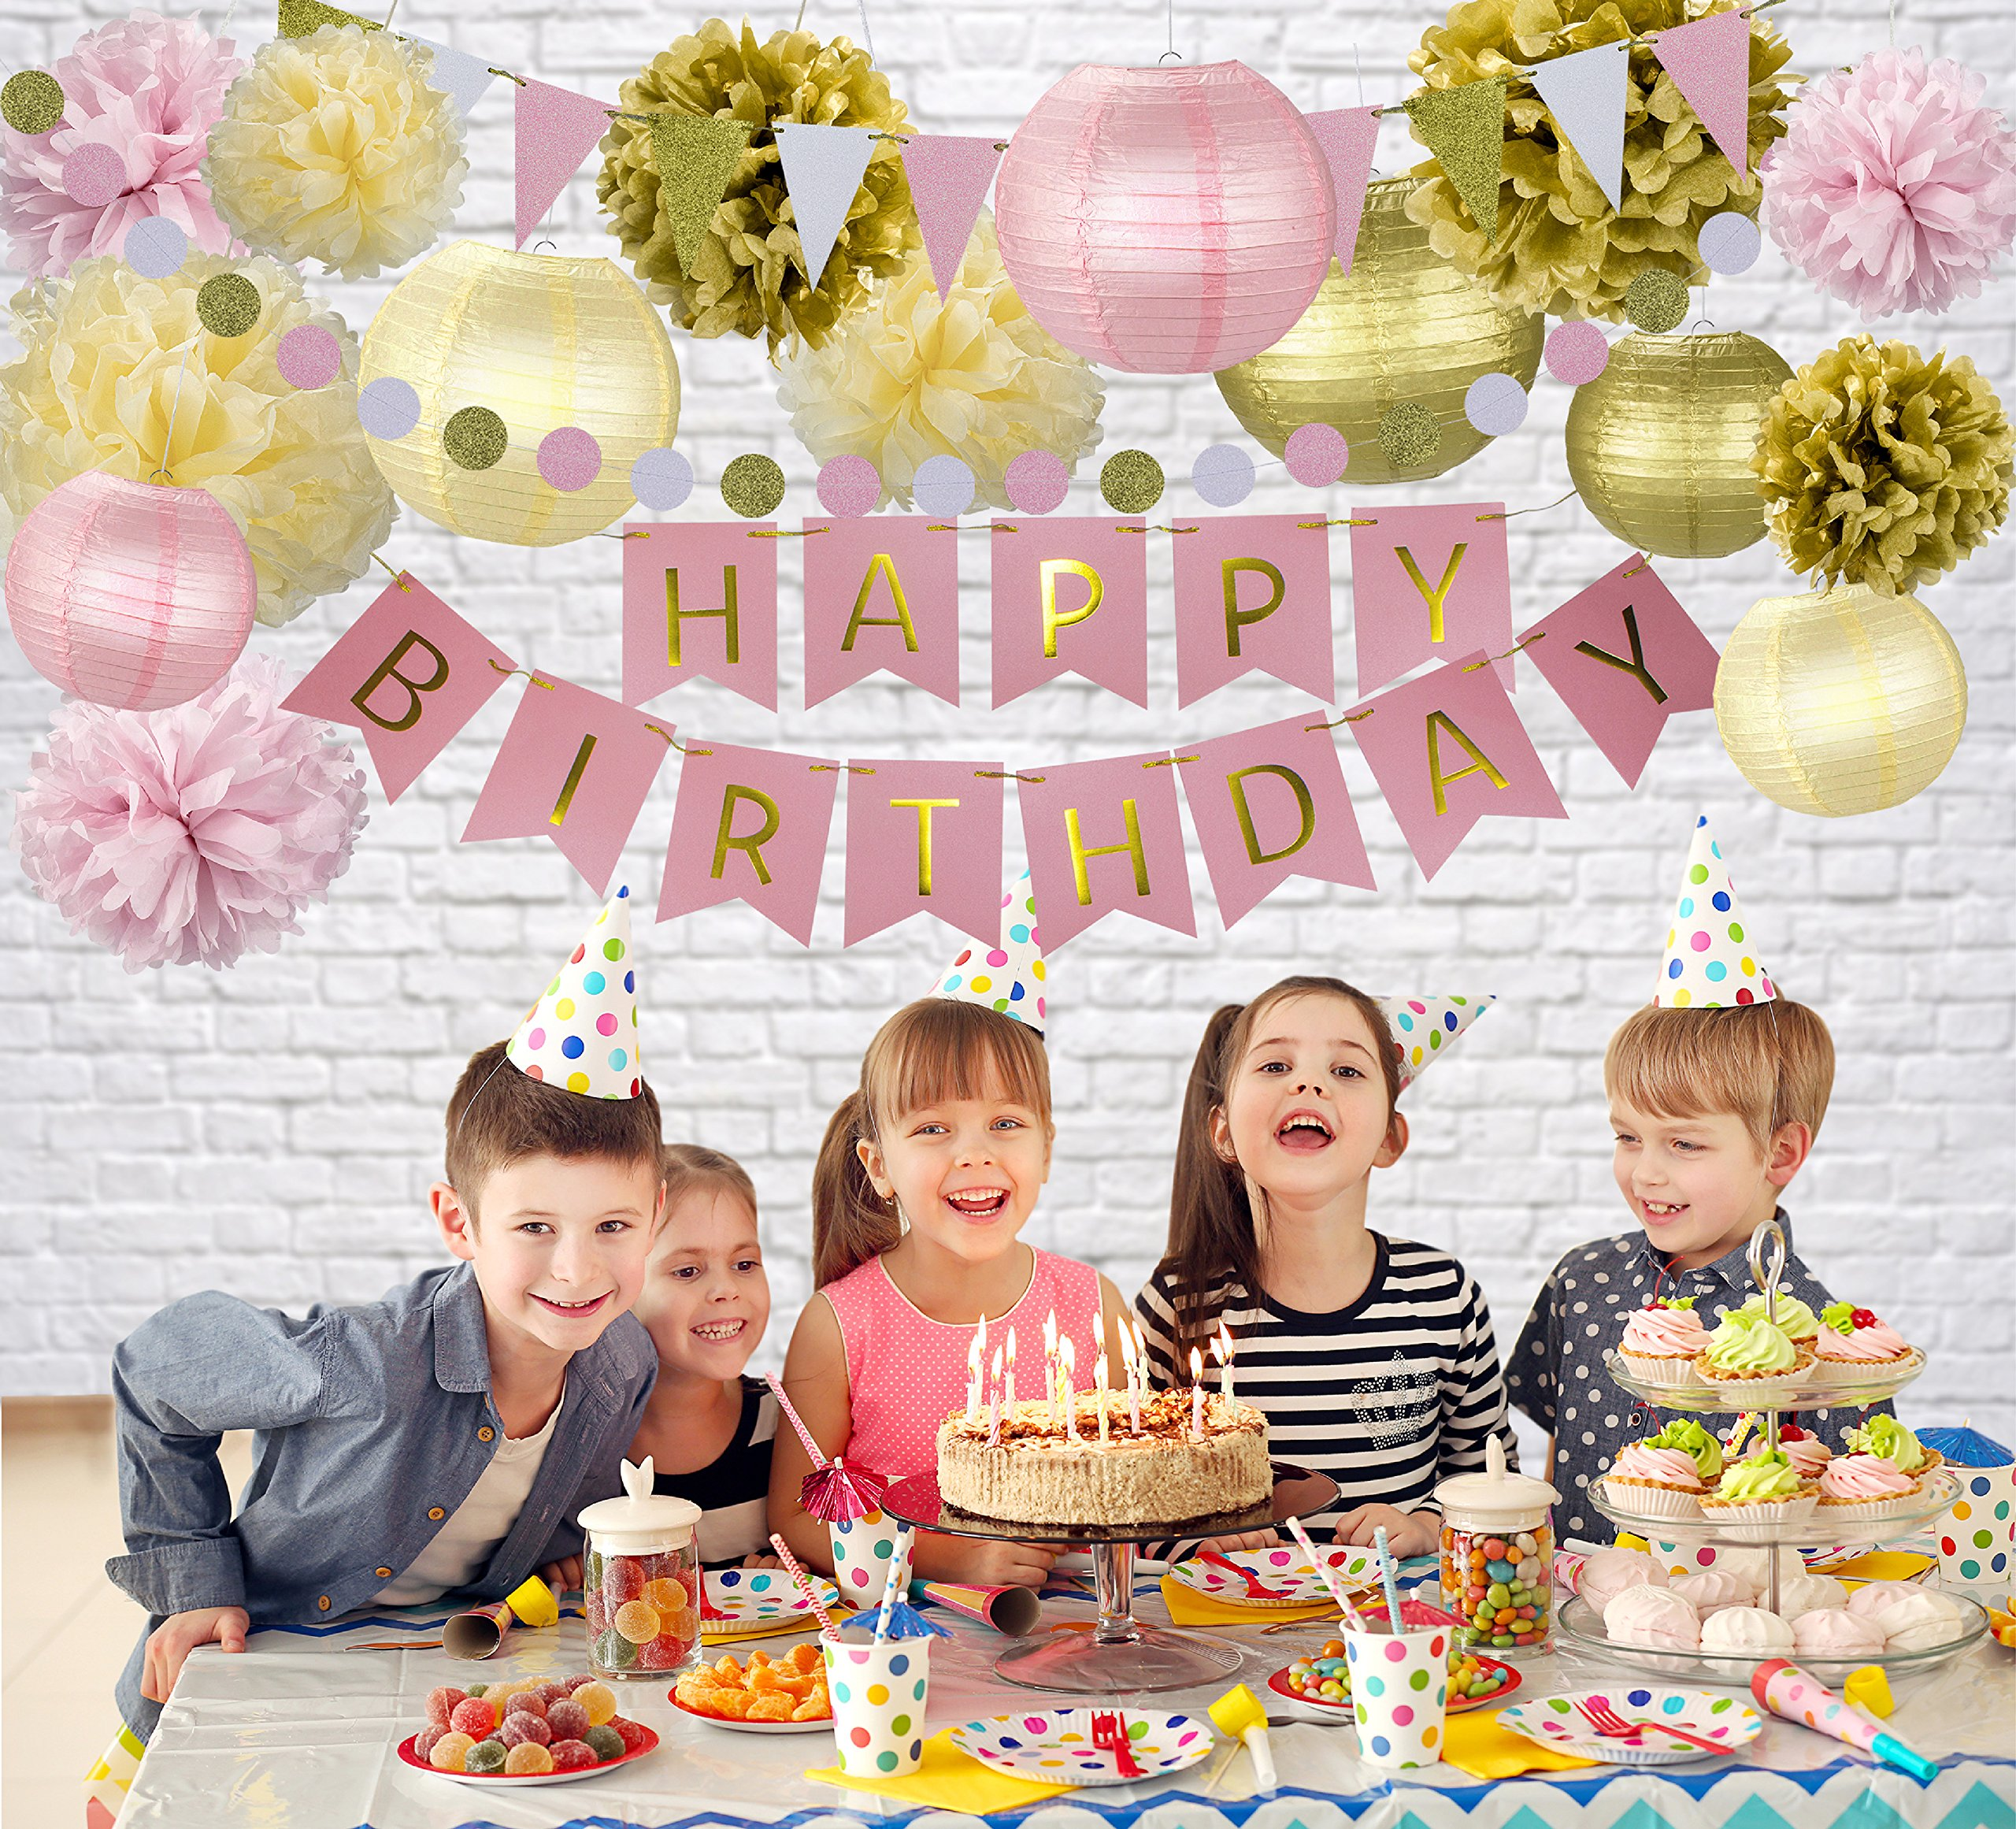 31 Pcs Of Pink Gold And Cream Birthday Party Decoration Set PomPom Lanterns Polka Dot Triangle Garland Banner First 1st Girl Princess Ballerina